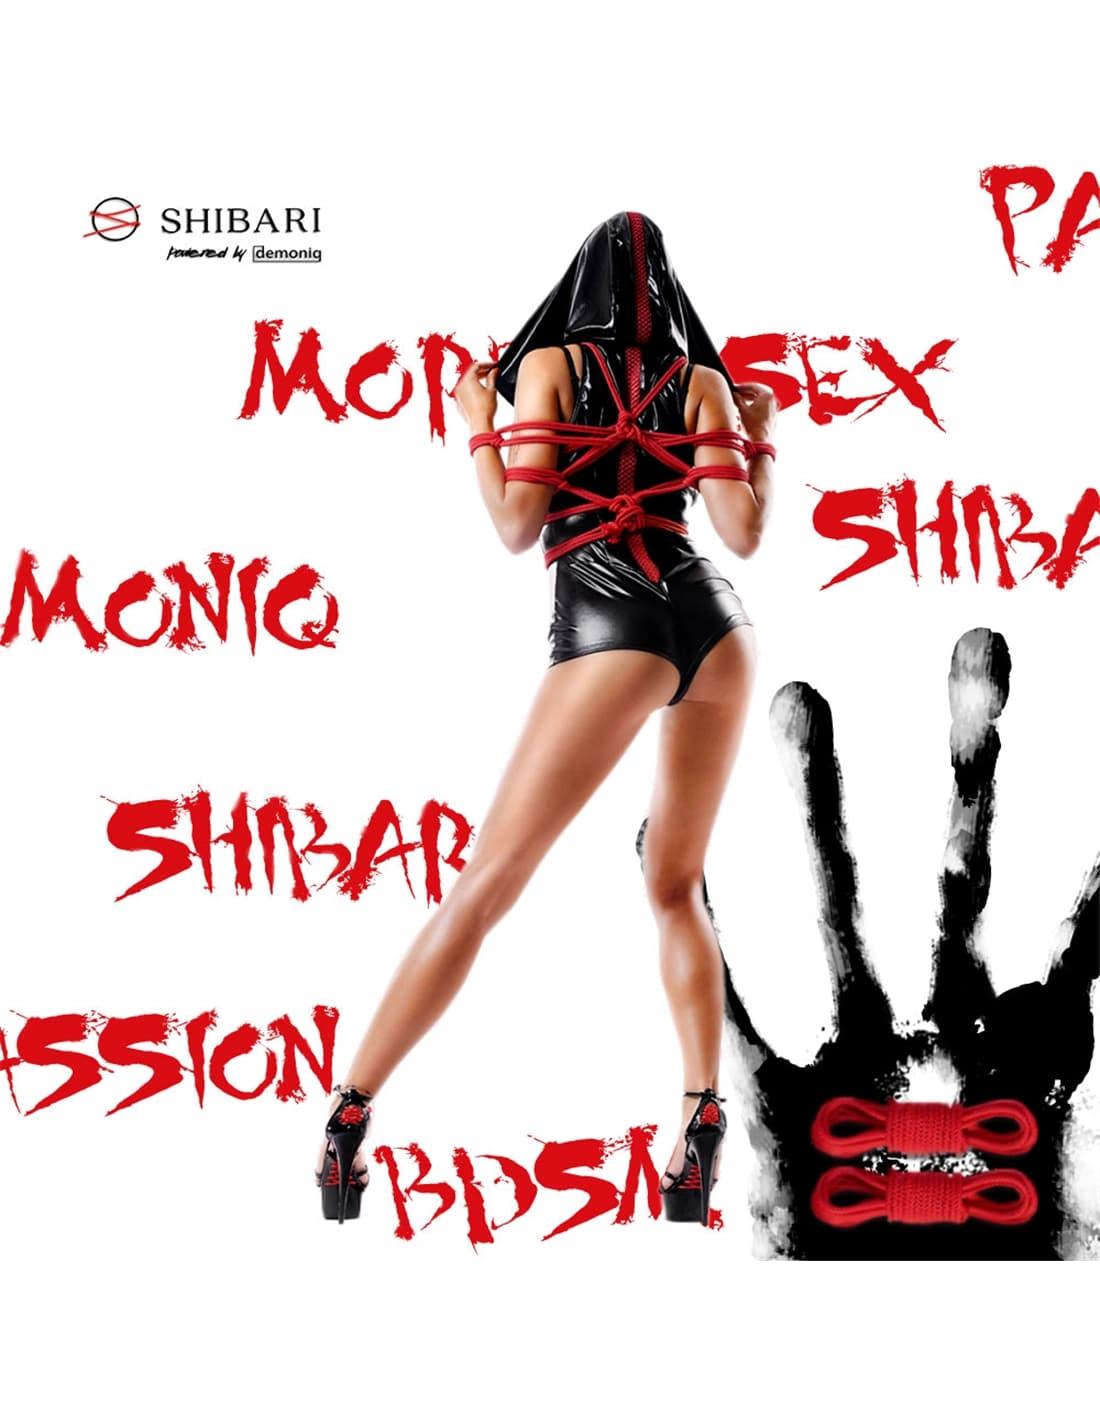 Macacão Hoshi Shibari Pack Demoniq Preto - 44 XXL - PR2010343431